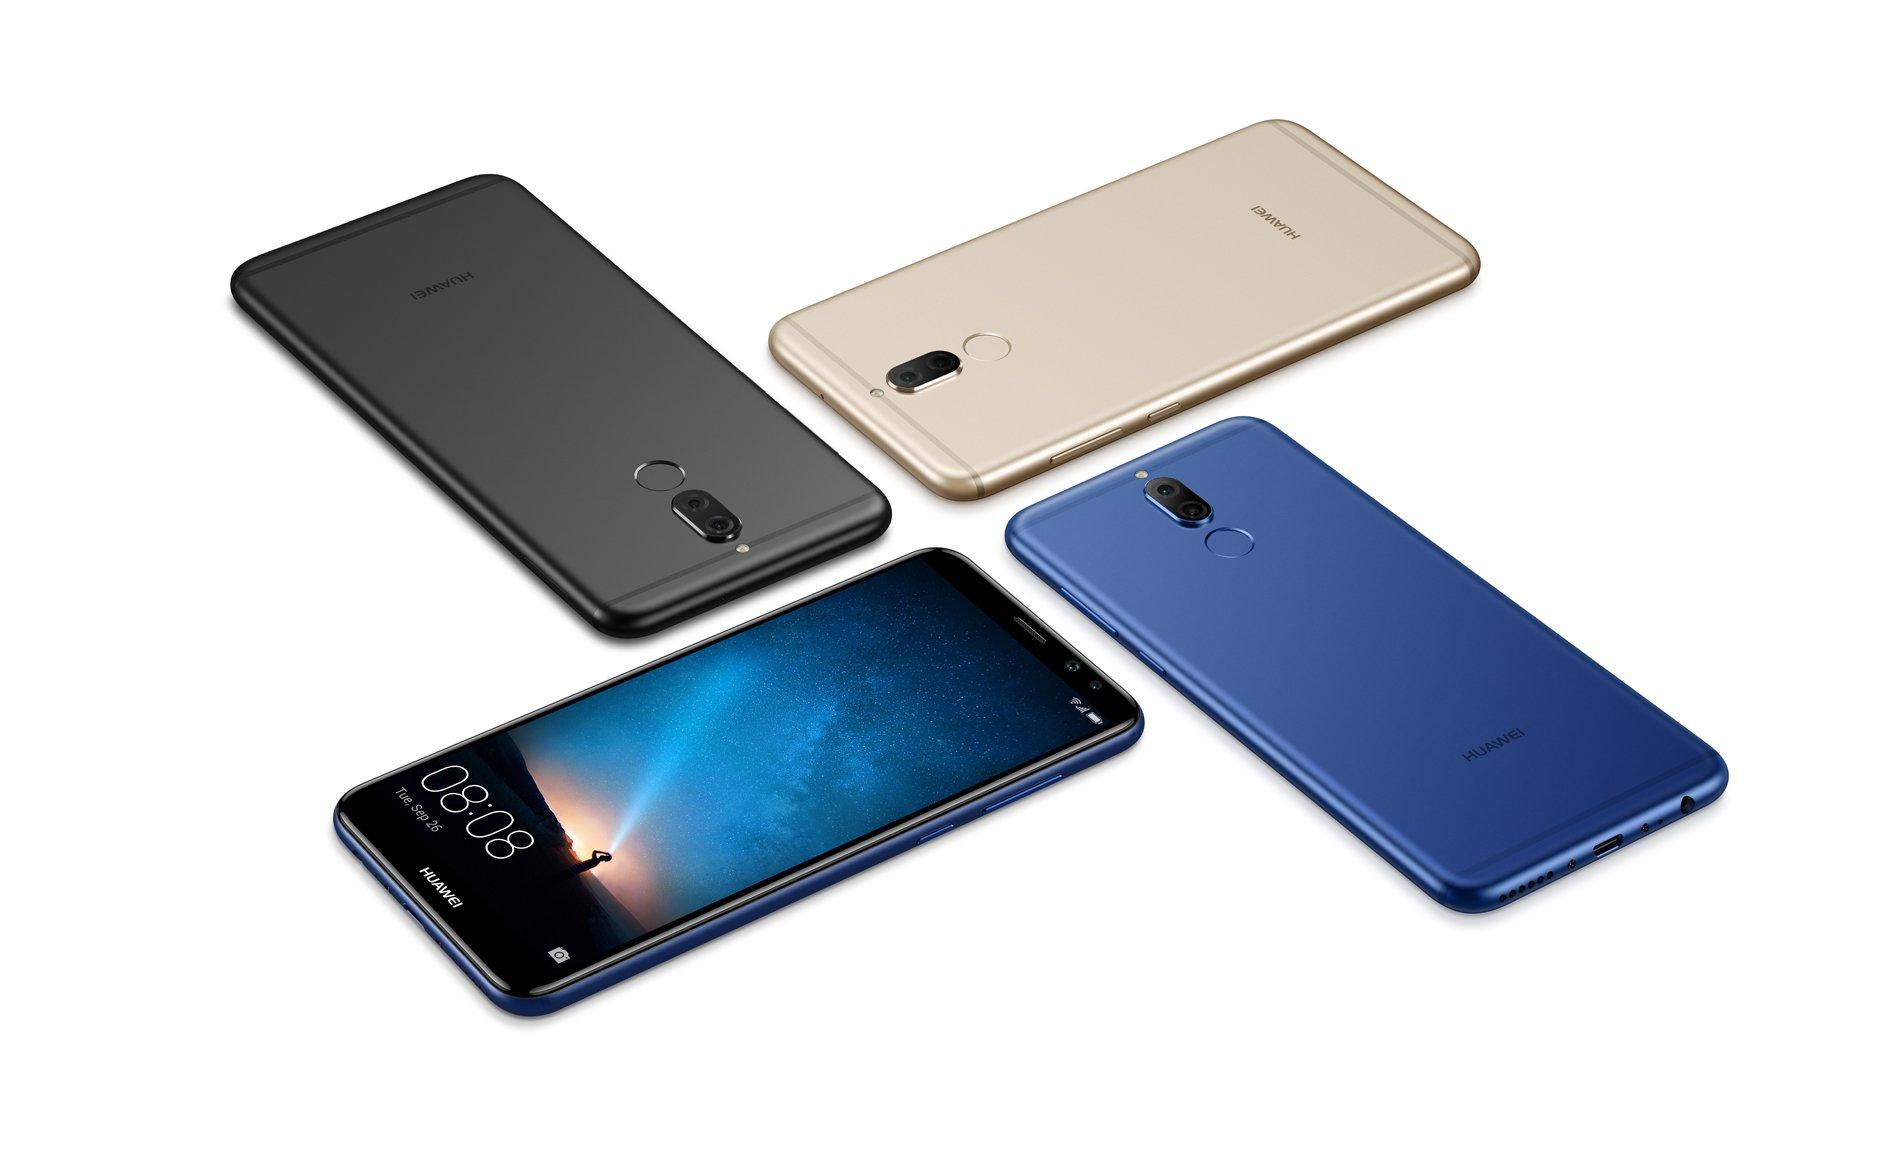 Tabletowo.pl Huawei Mate 10 Lite vs Huawei Mate 9 Lite (Honor 6X) - porównanie parametrów Android Huawei Porównania Smartfony